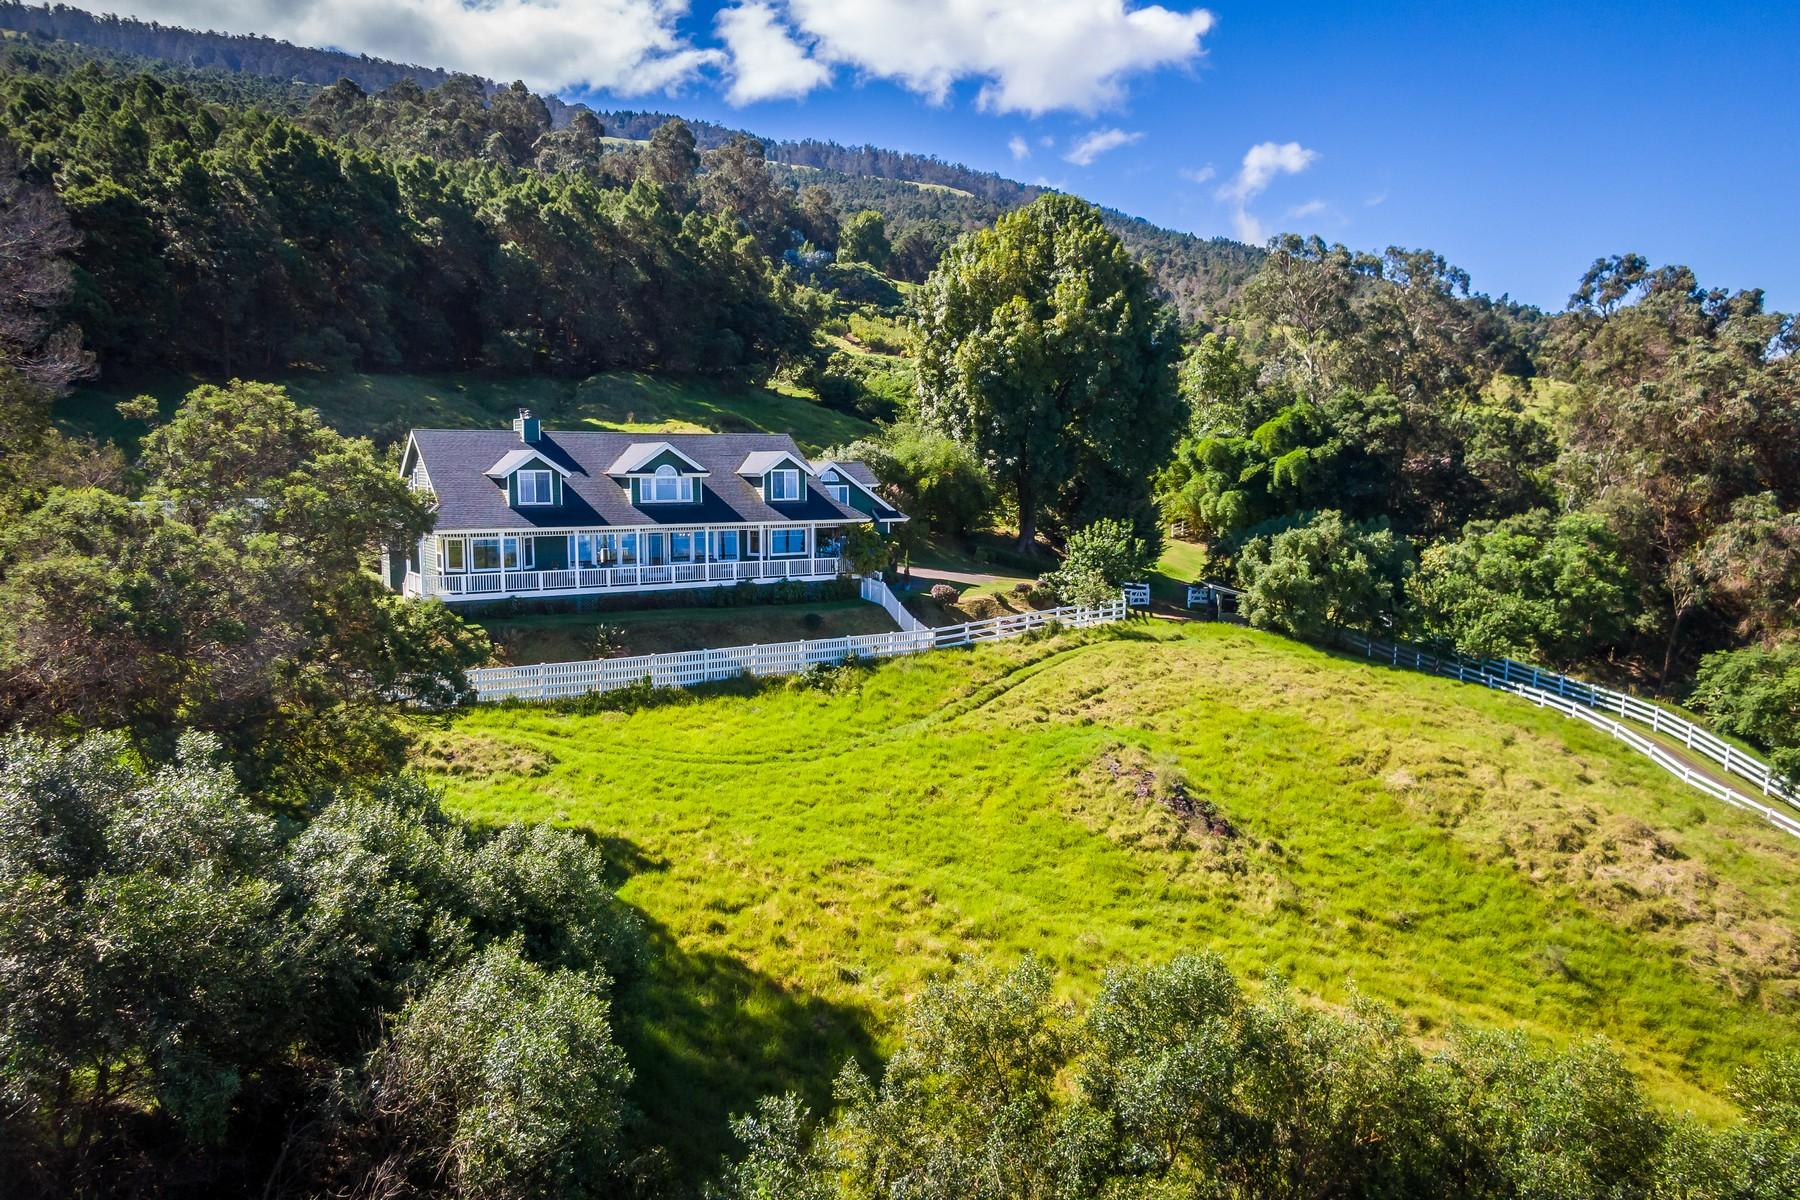 獨棟家庭住宅 為 出售 在 Secluded & Serene, Large Custom Kula Home with Bi-Coastal Views 1511 Polipoli Road Kula, 夏威夷 96790 美國